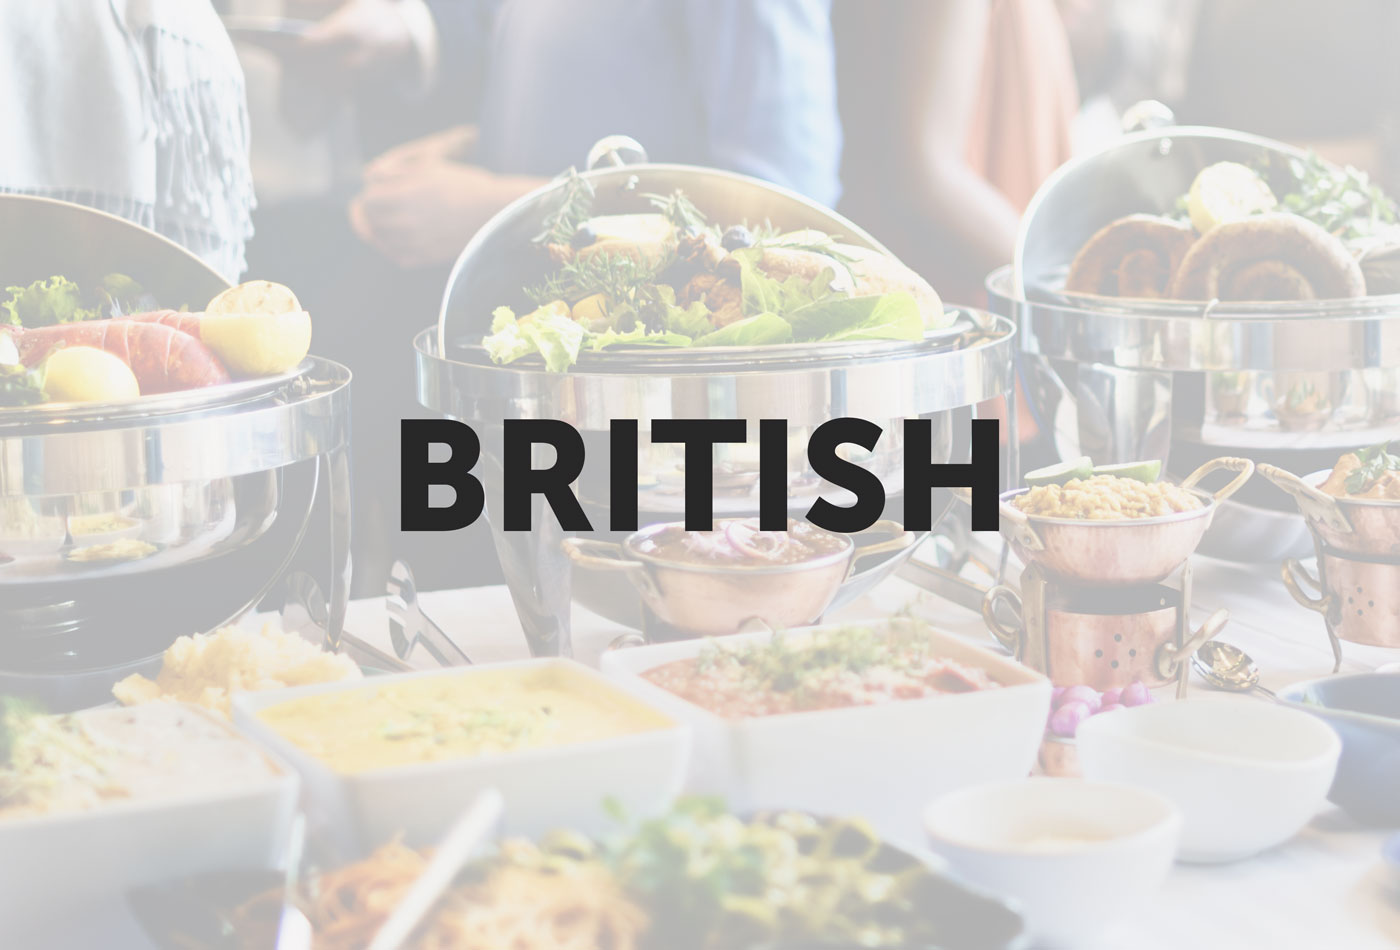 British--Buffet-at-Great-British-Restaurant